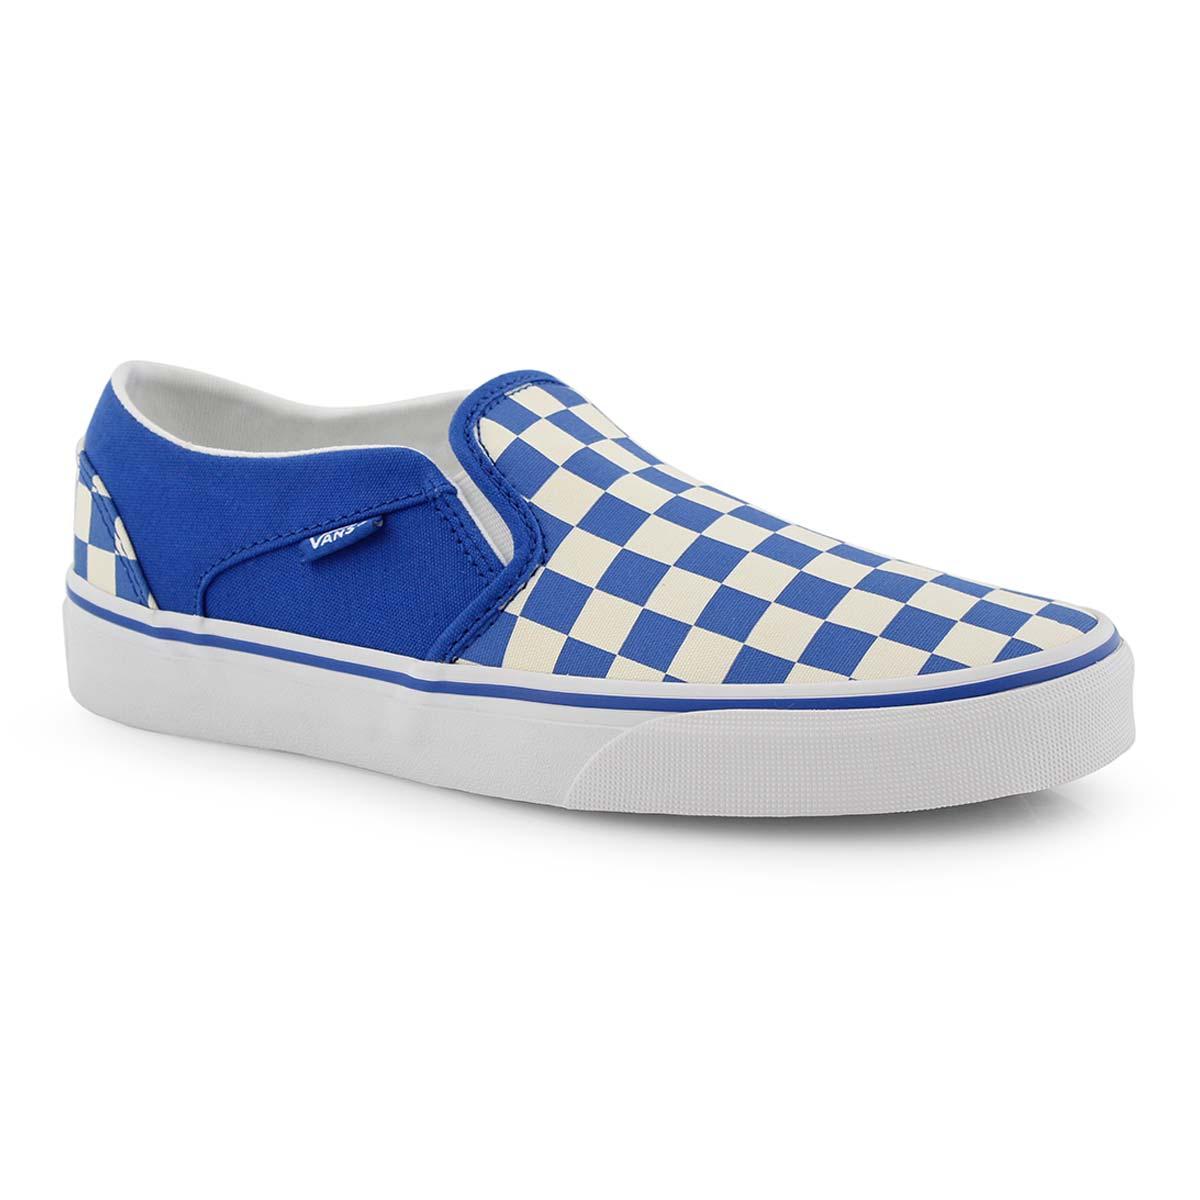 vans damier bleu